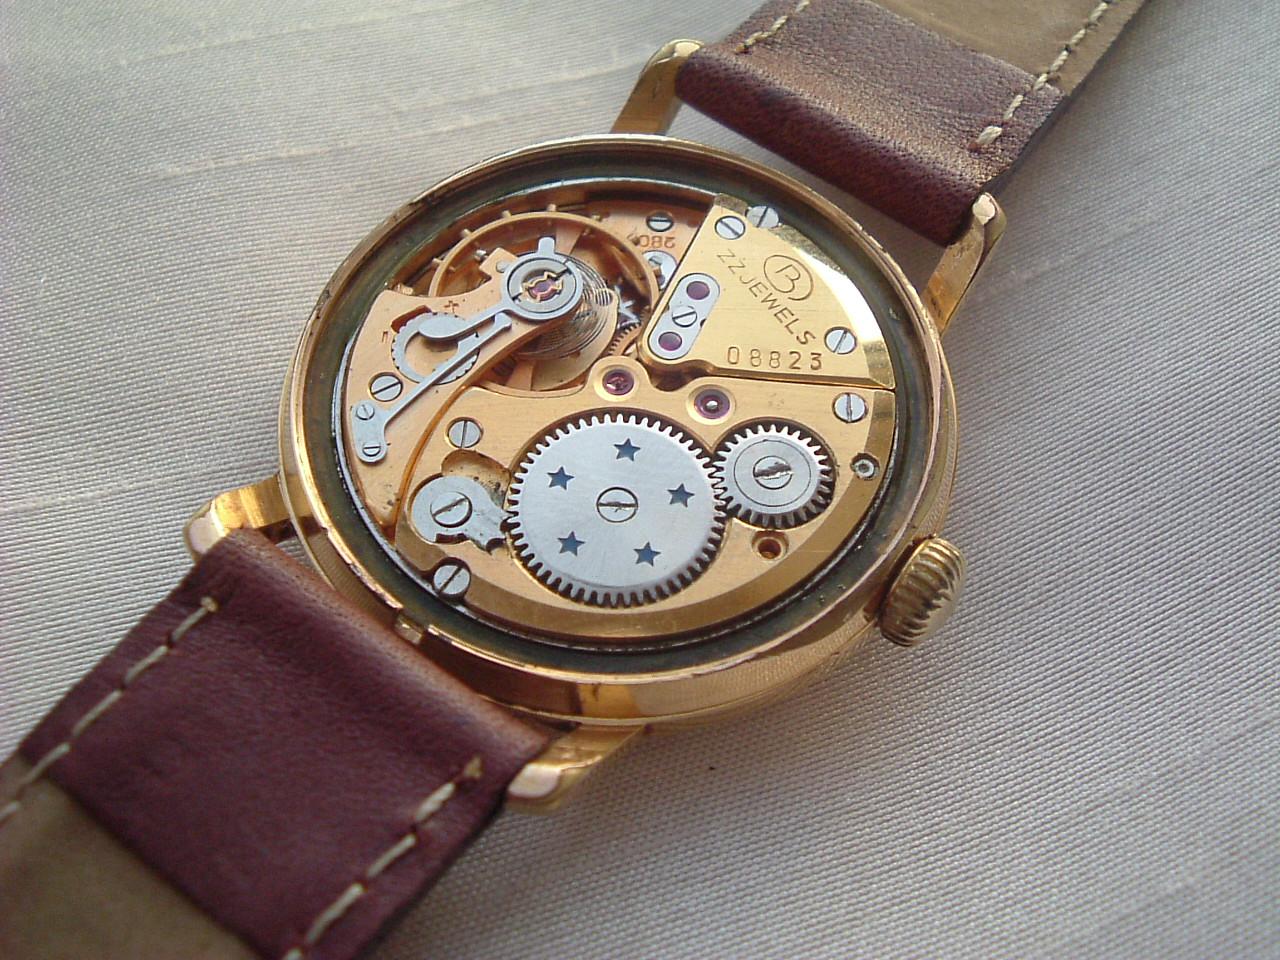 Volna-Russian2-zenith-calibre-135-chronometer-2.jpg